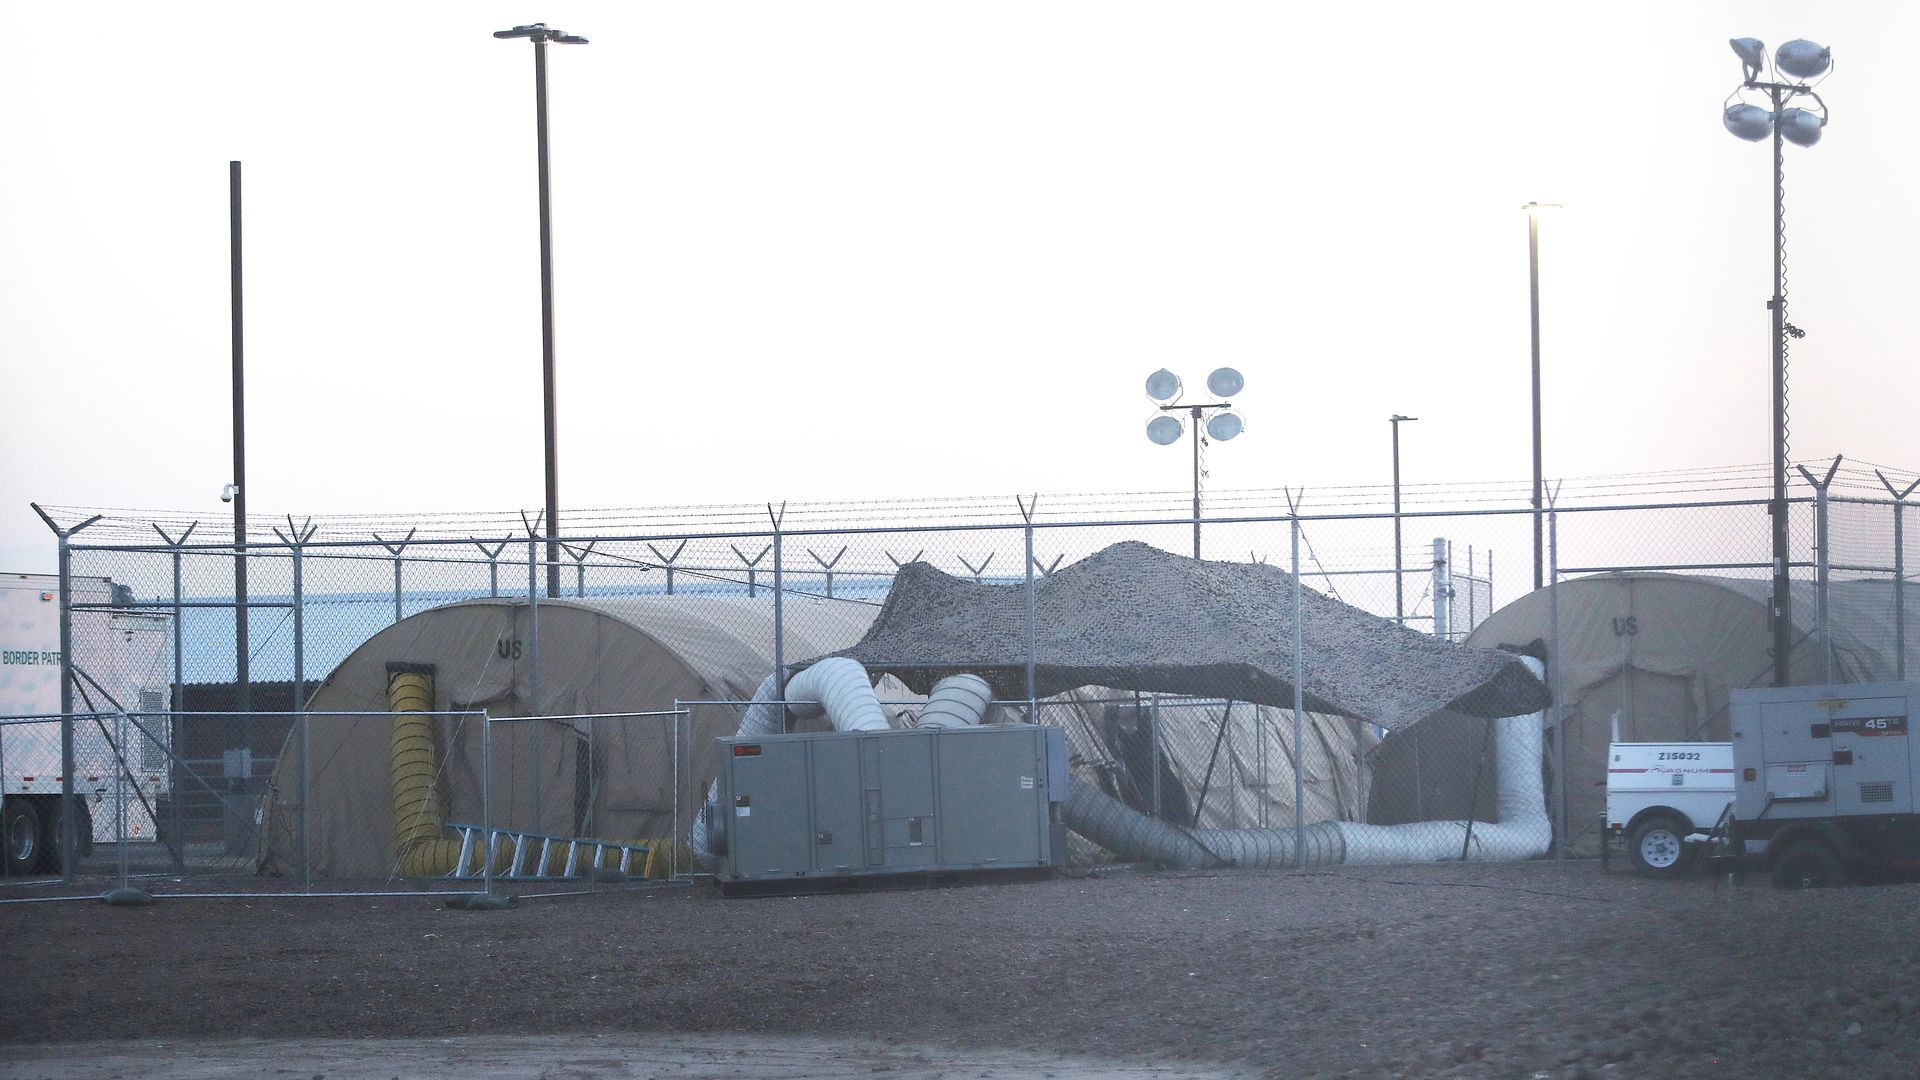 Migrant detention facility